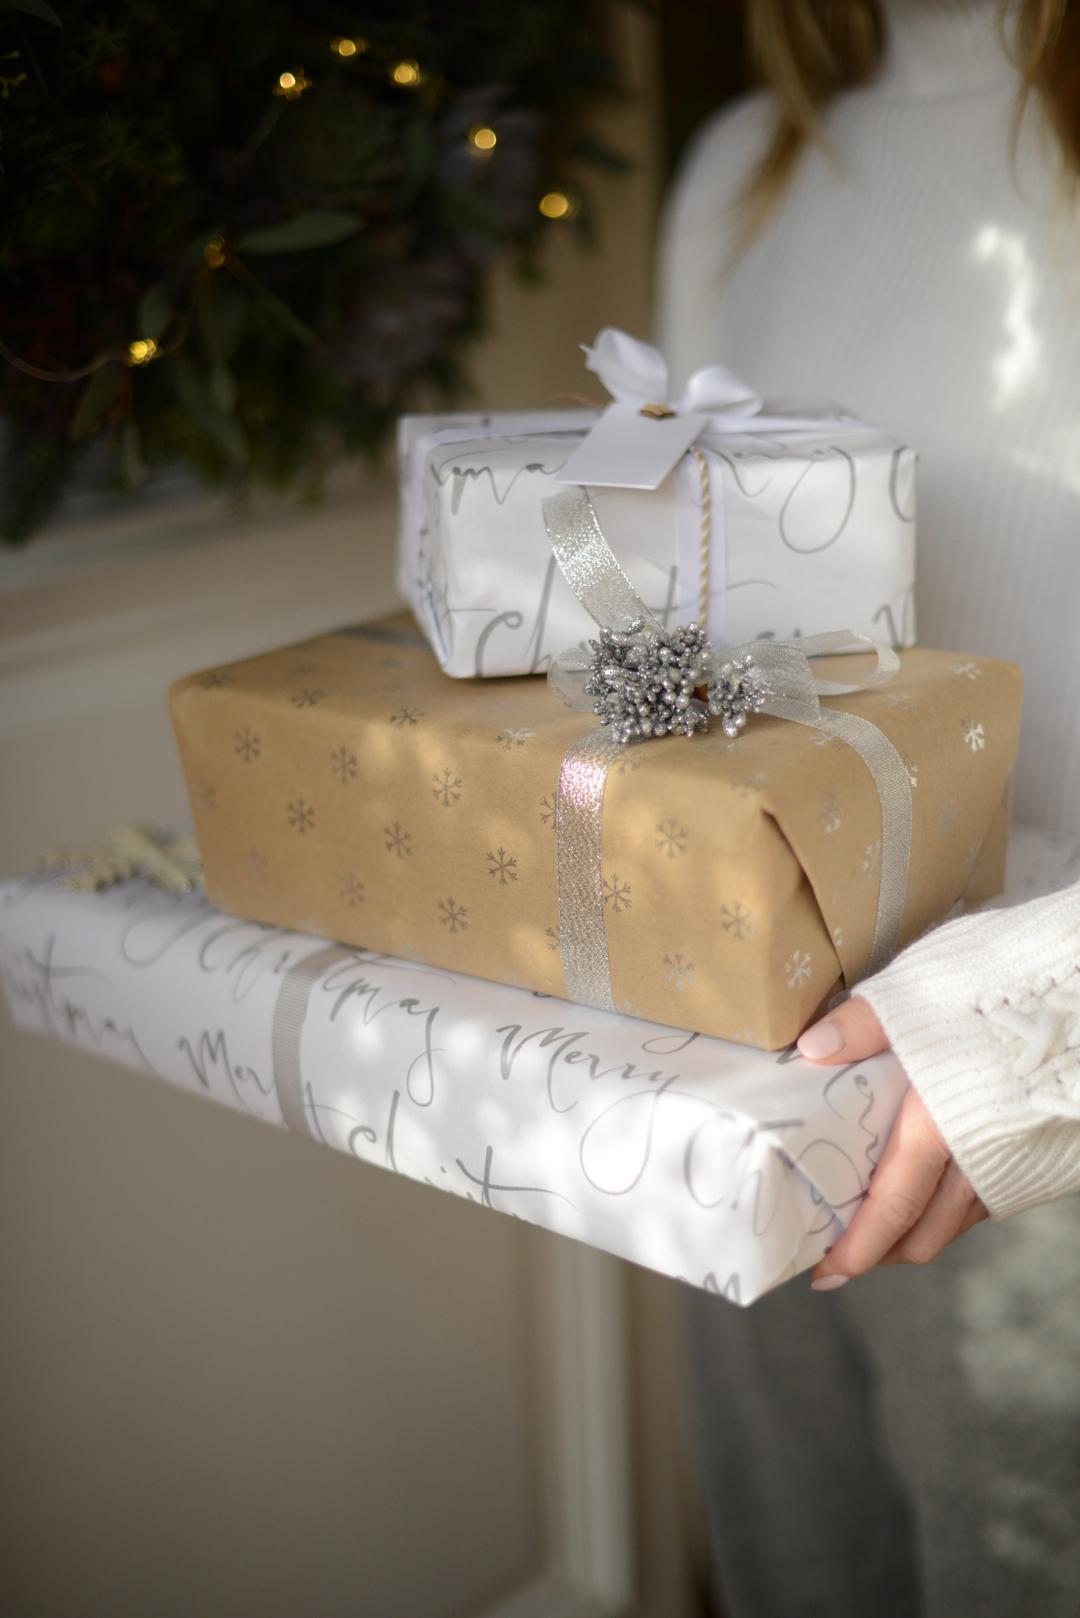 festive gift wrap